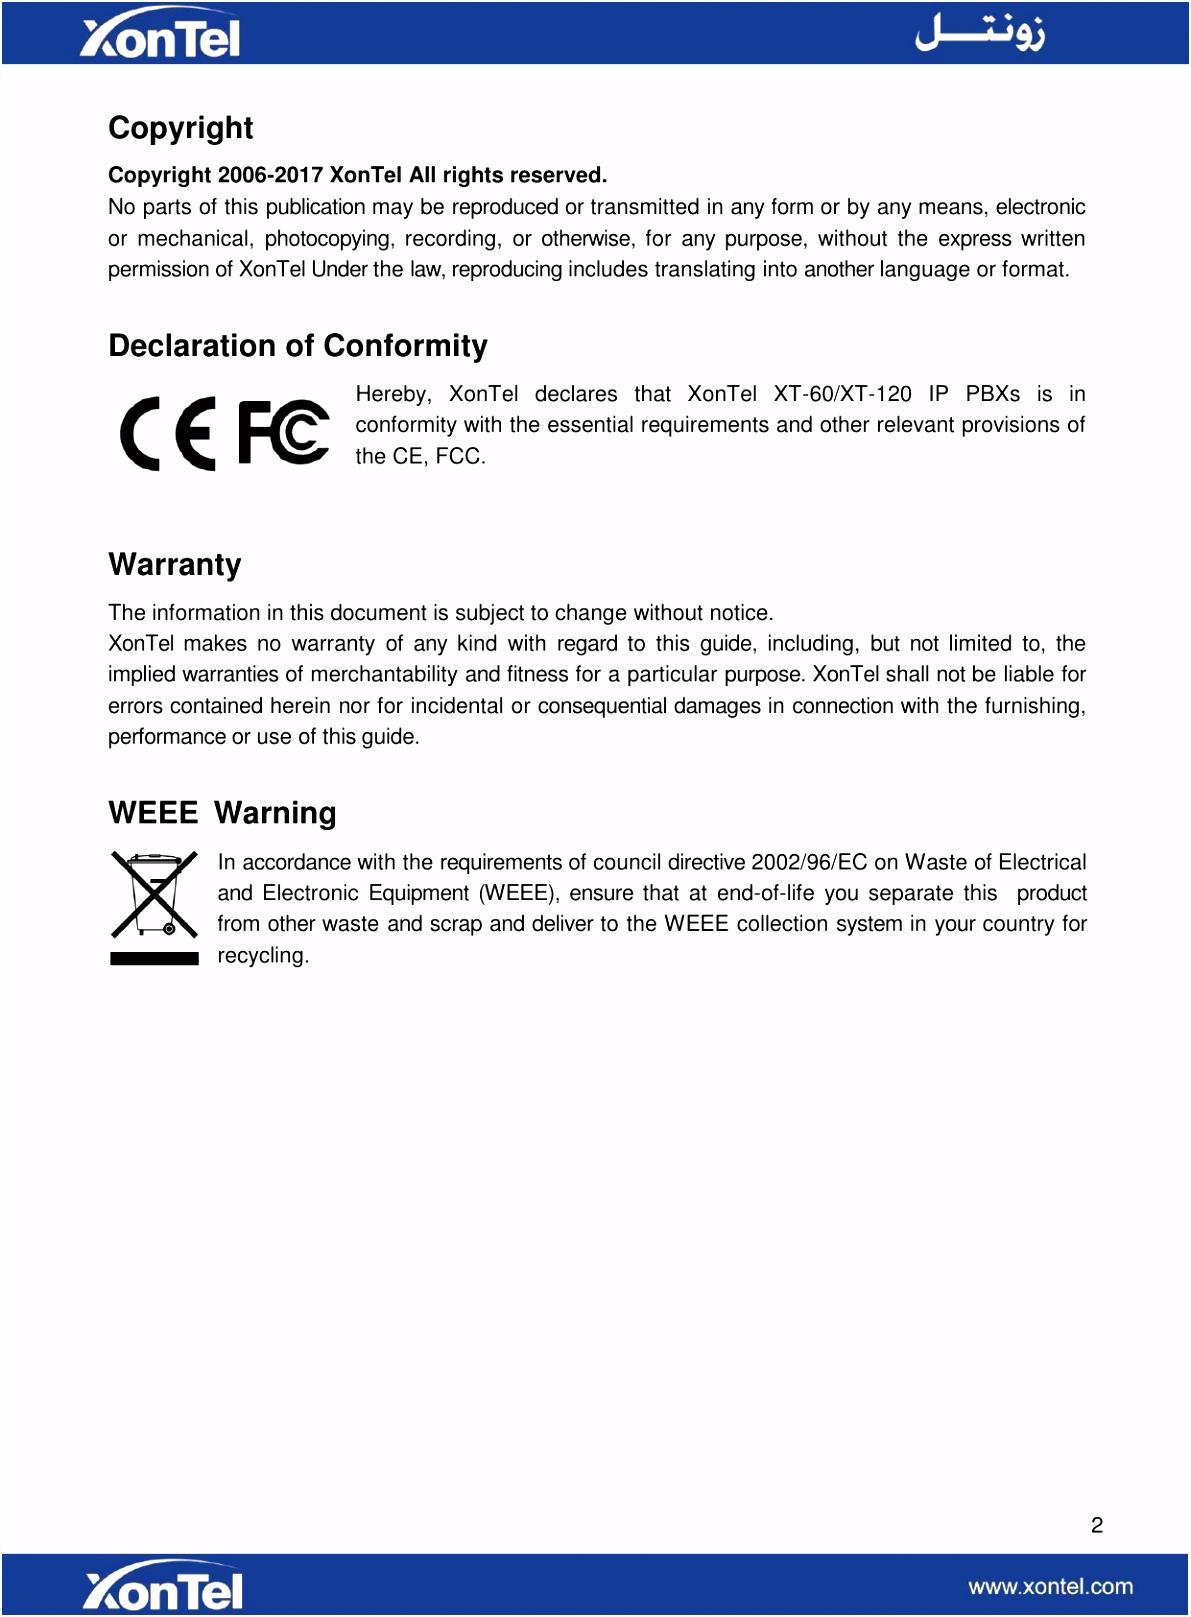 Xontel Xt 60 And 120 Pbxs User Manual & Xon Tel